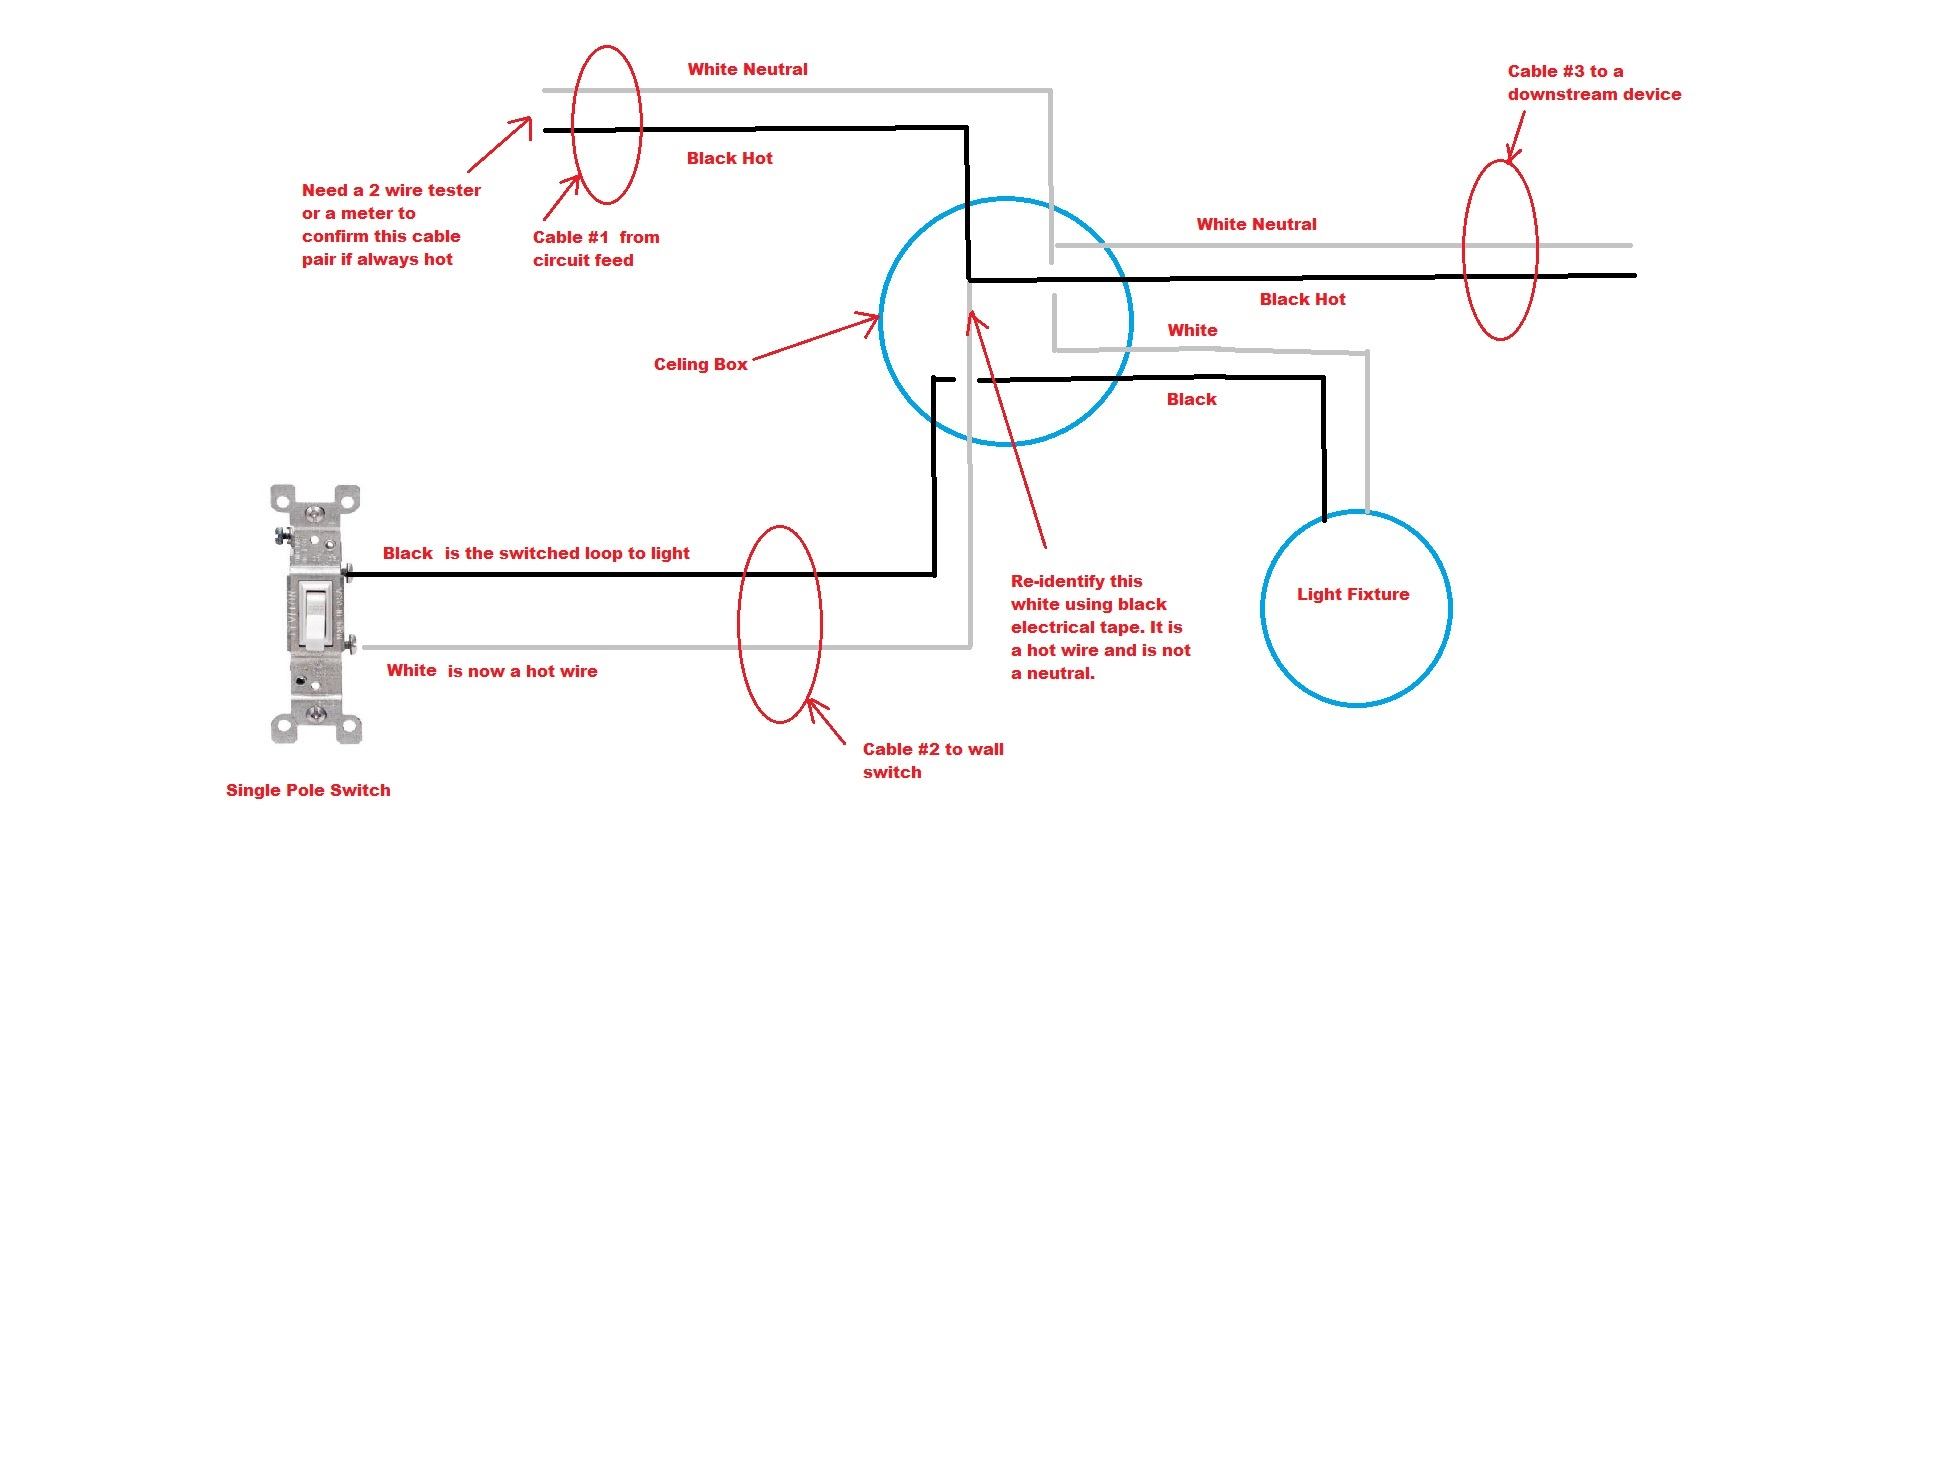 c4ebdc8d-c0c2-43a4-8439-6a116bb296b0_3 cable ceiling box.jpg